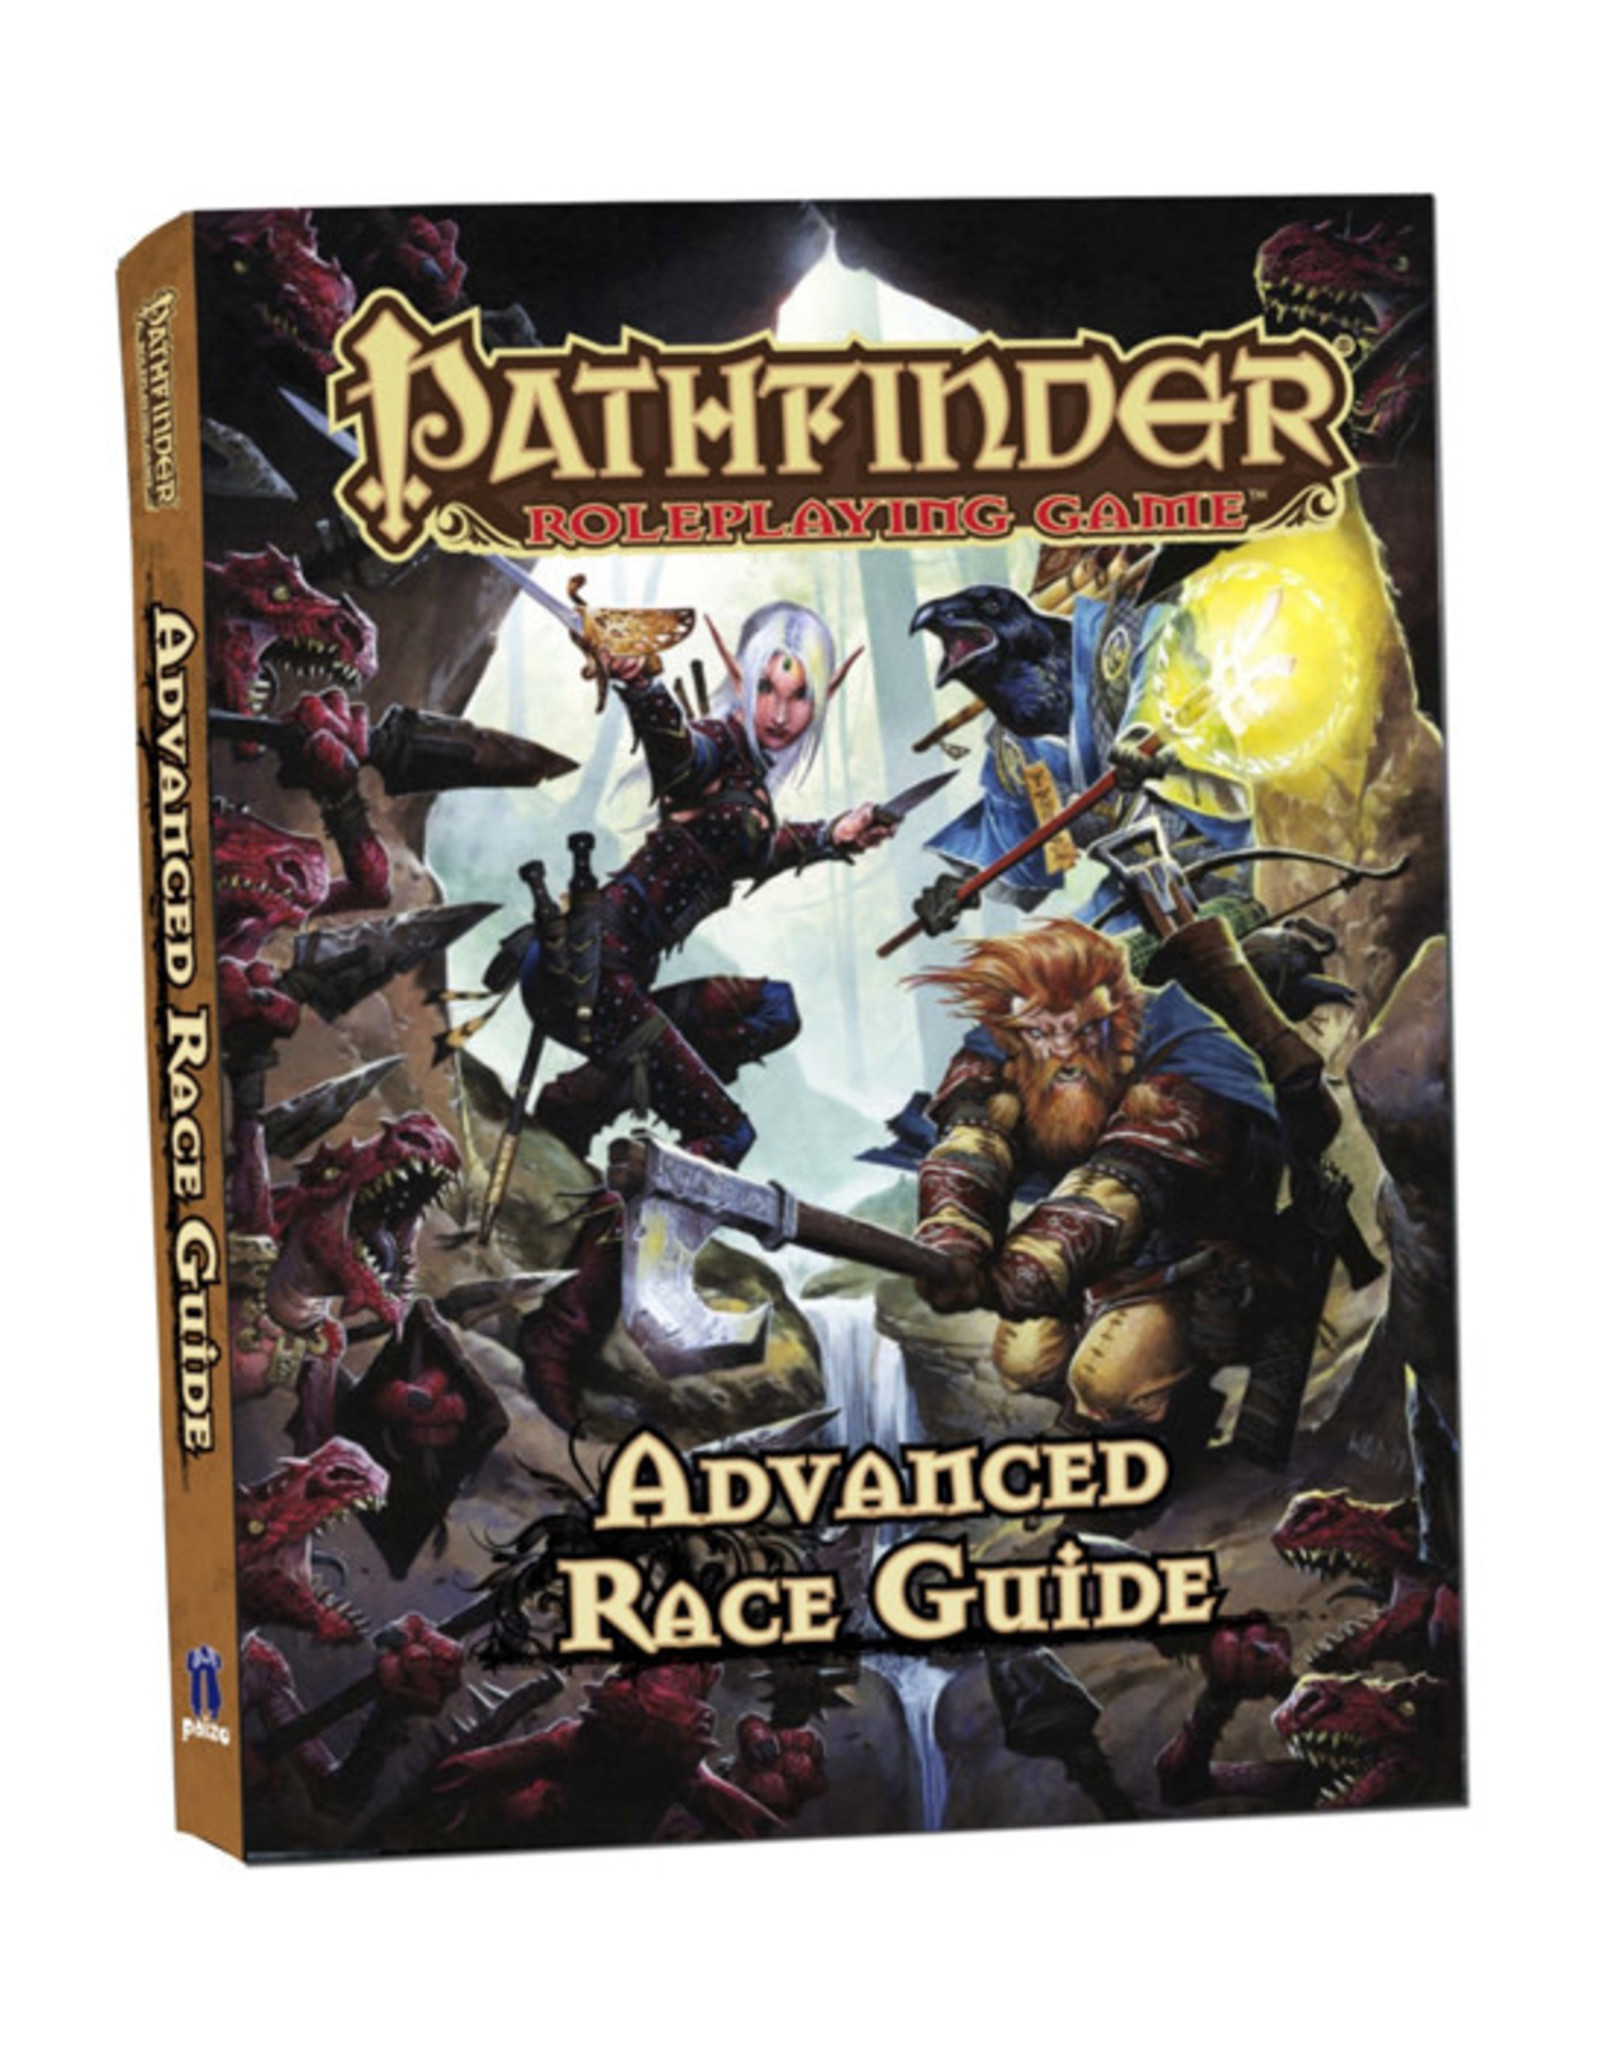 Pathfinder Pathfinder: Advanced Race Guide